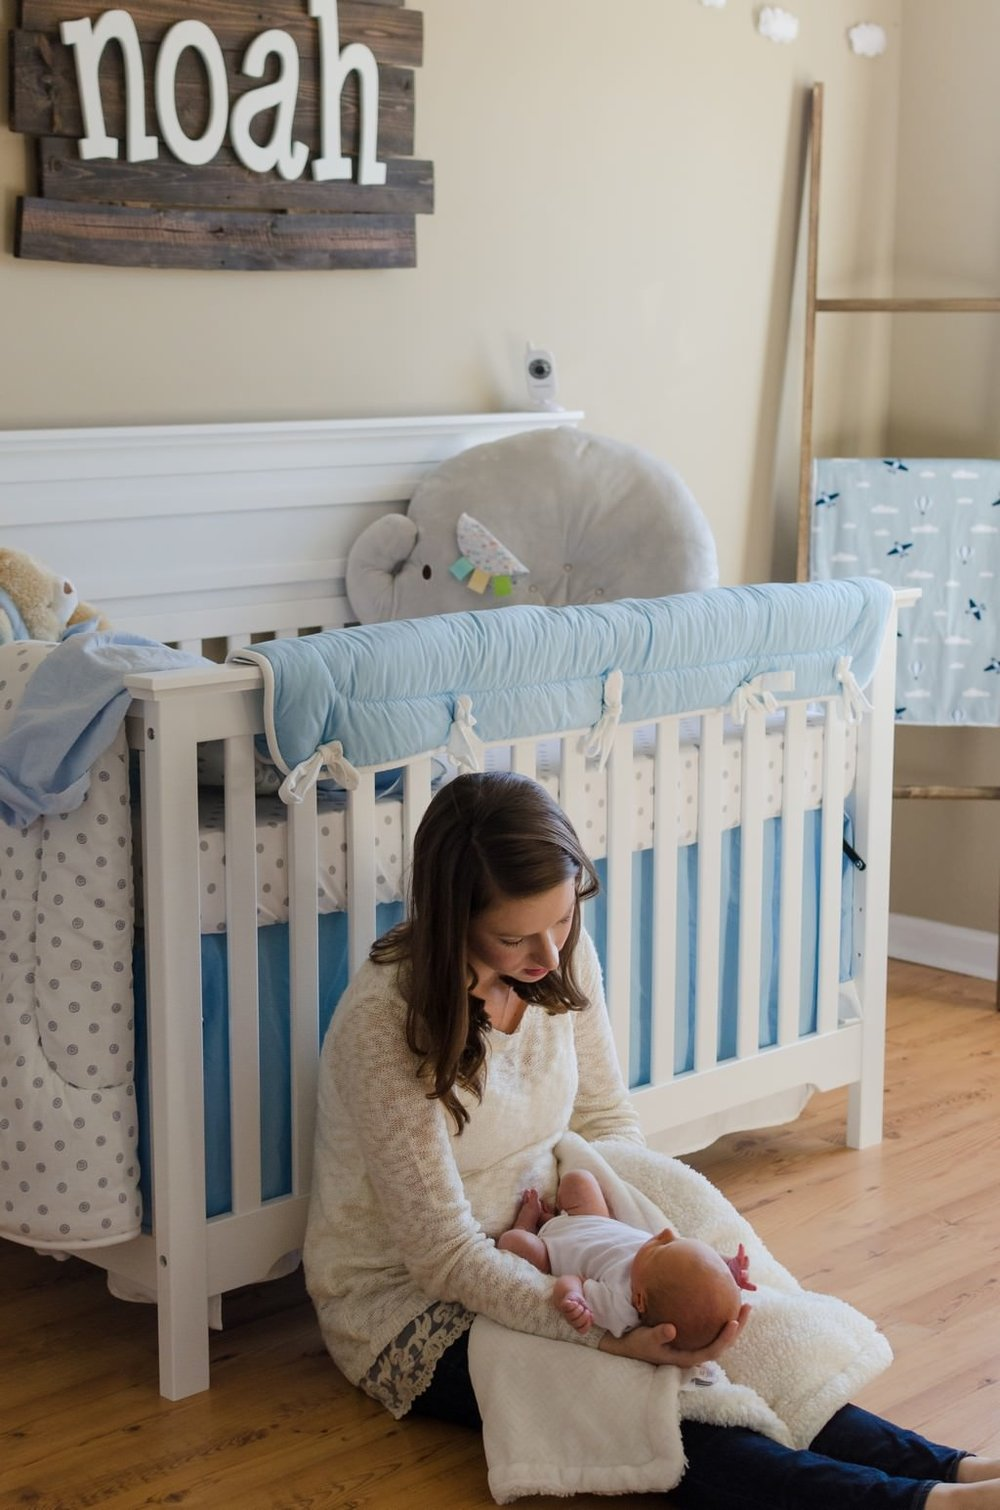 Noah-In-Home-Lifestyle-Newborn-Session-Murfreesboro-Nashville-Photographers+15